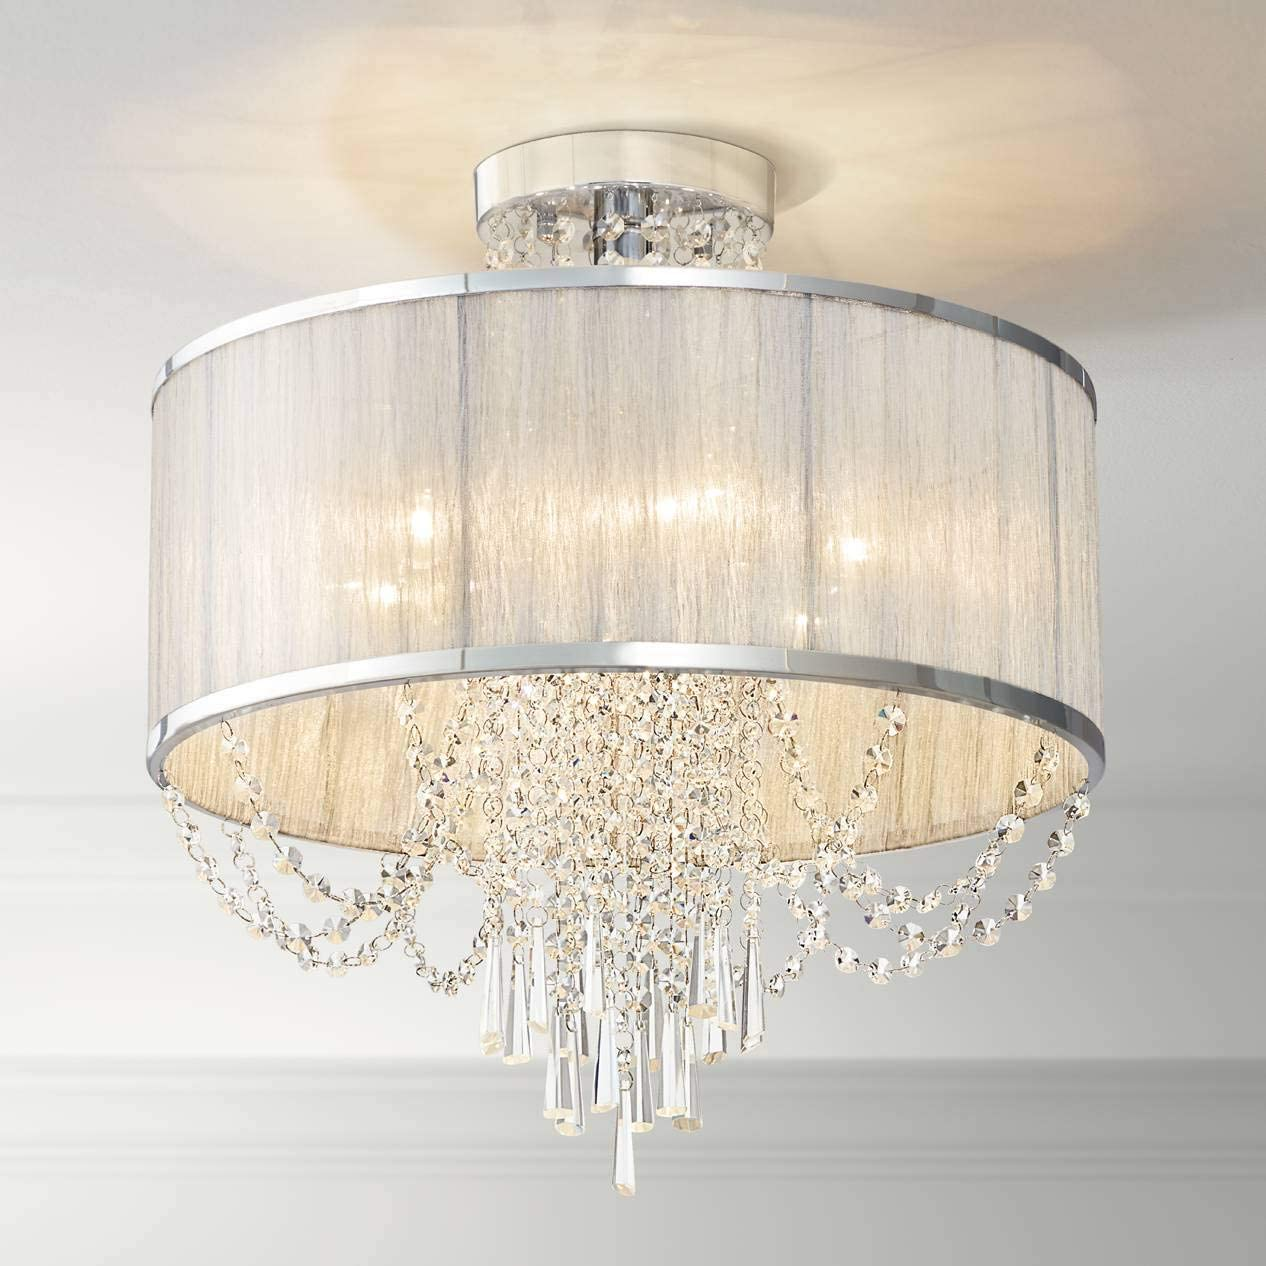 Ellisia 19 3 4 W Silver Organza Shade Chrome Ceiling Light – Vienna Full Spectrum